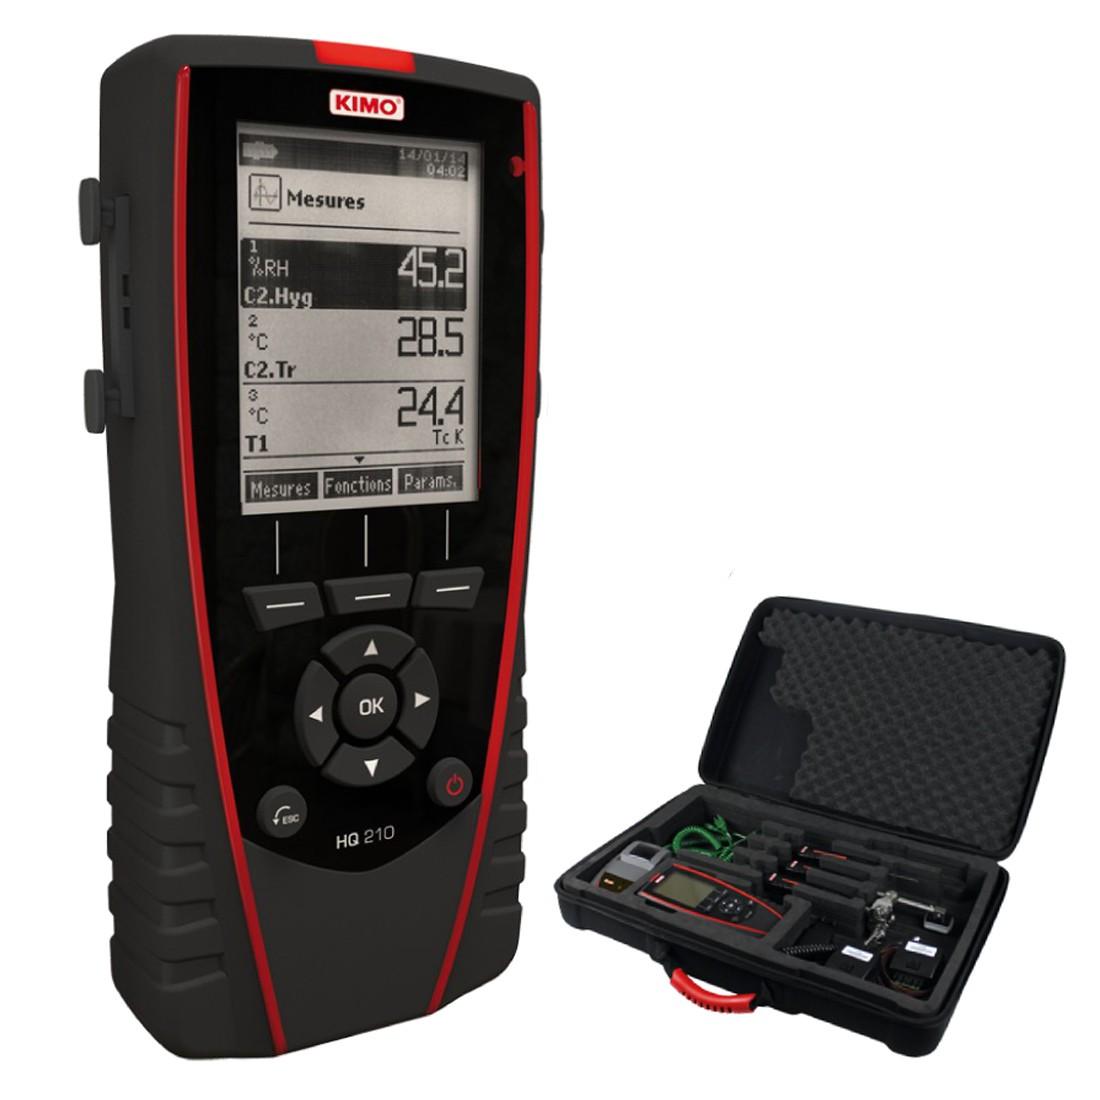 KIMO HQ 210 Multifunktionshygrometer, Luftqualitätsmessgerät